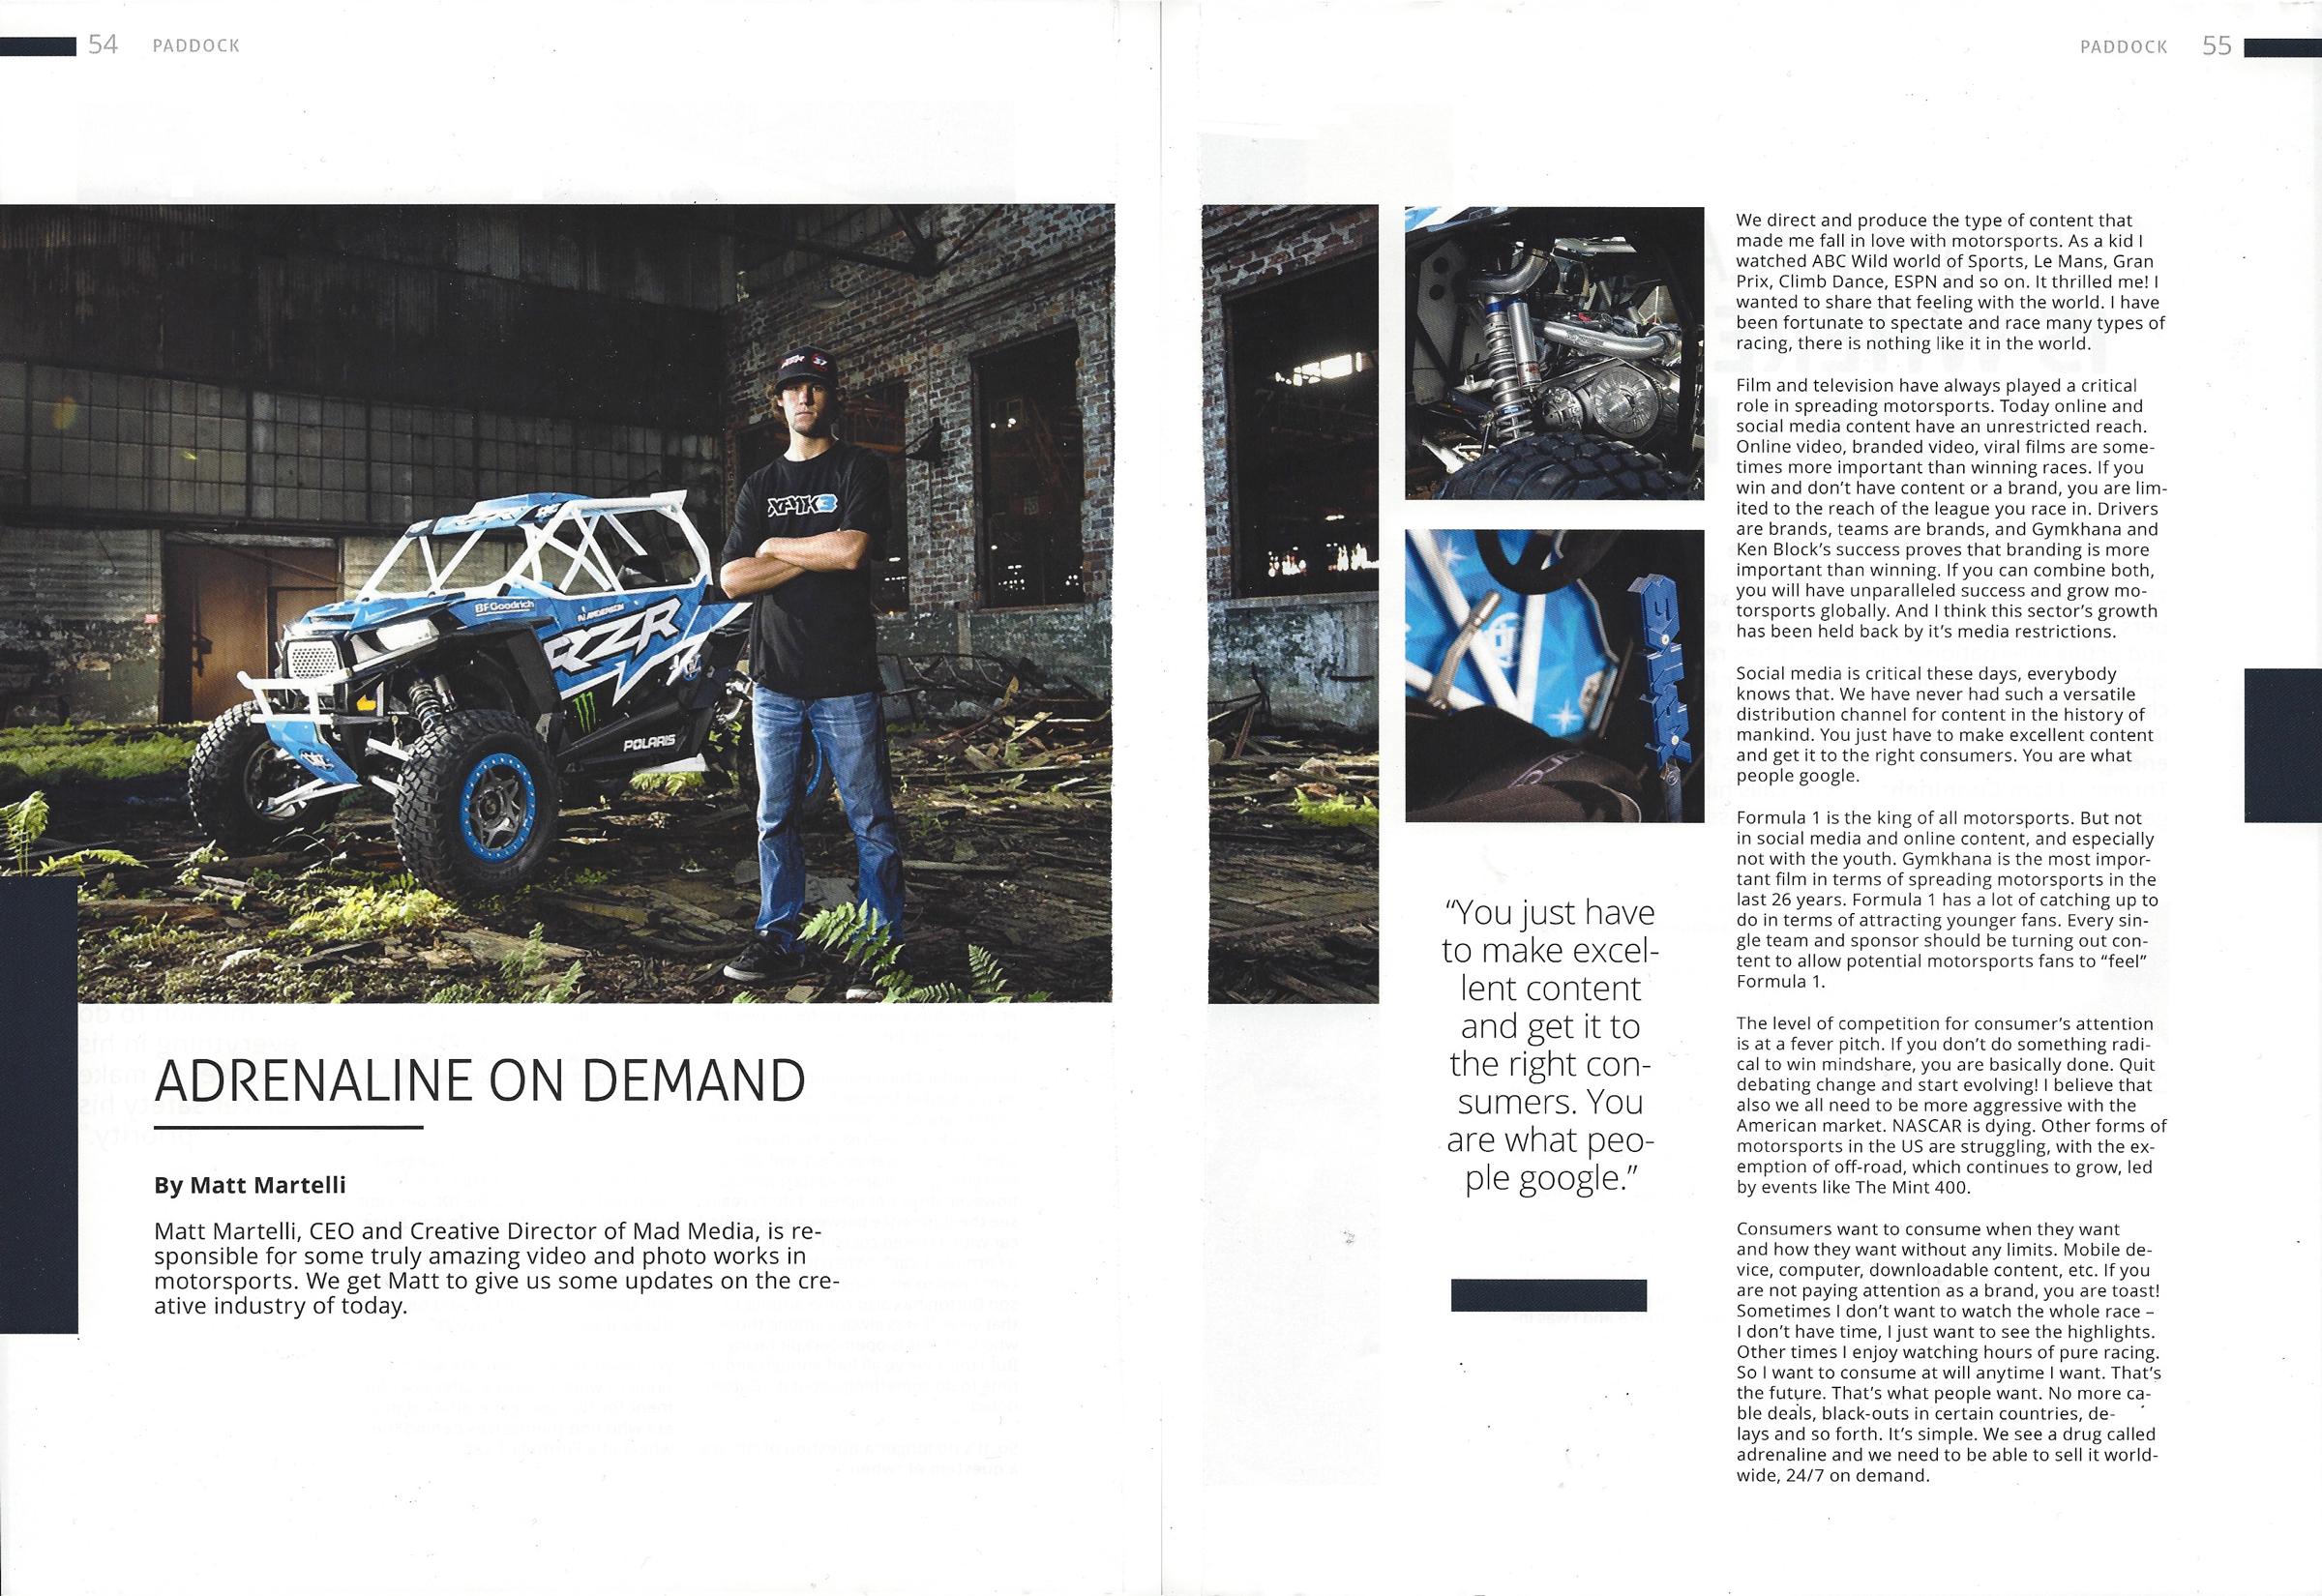 paddock_magazine_article_spread_matt_martelli